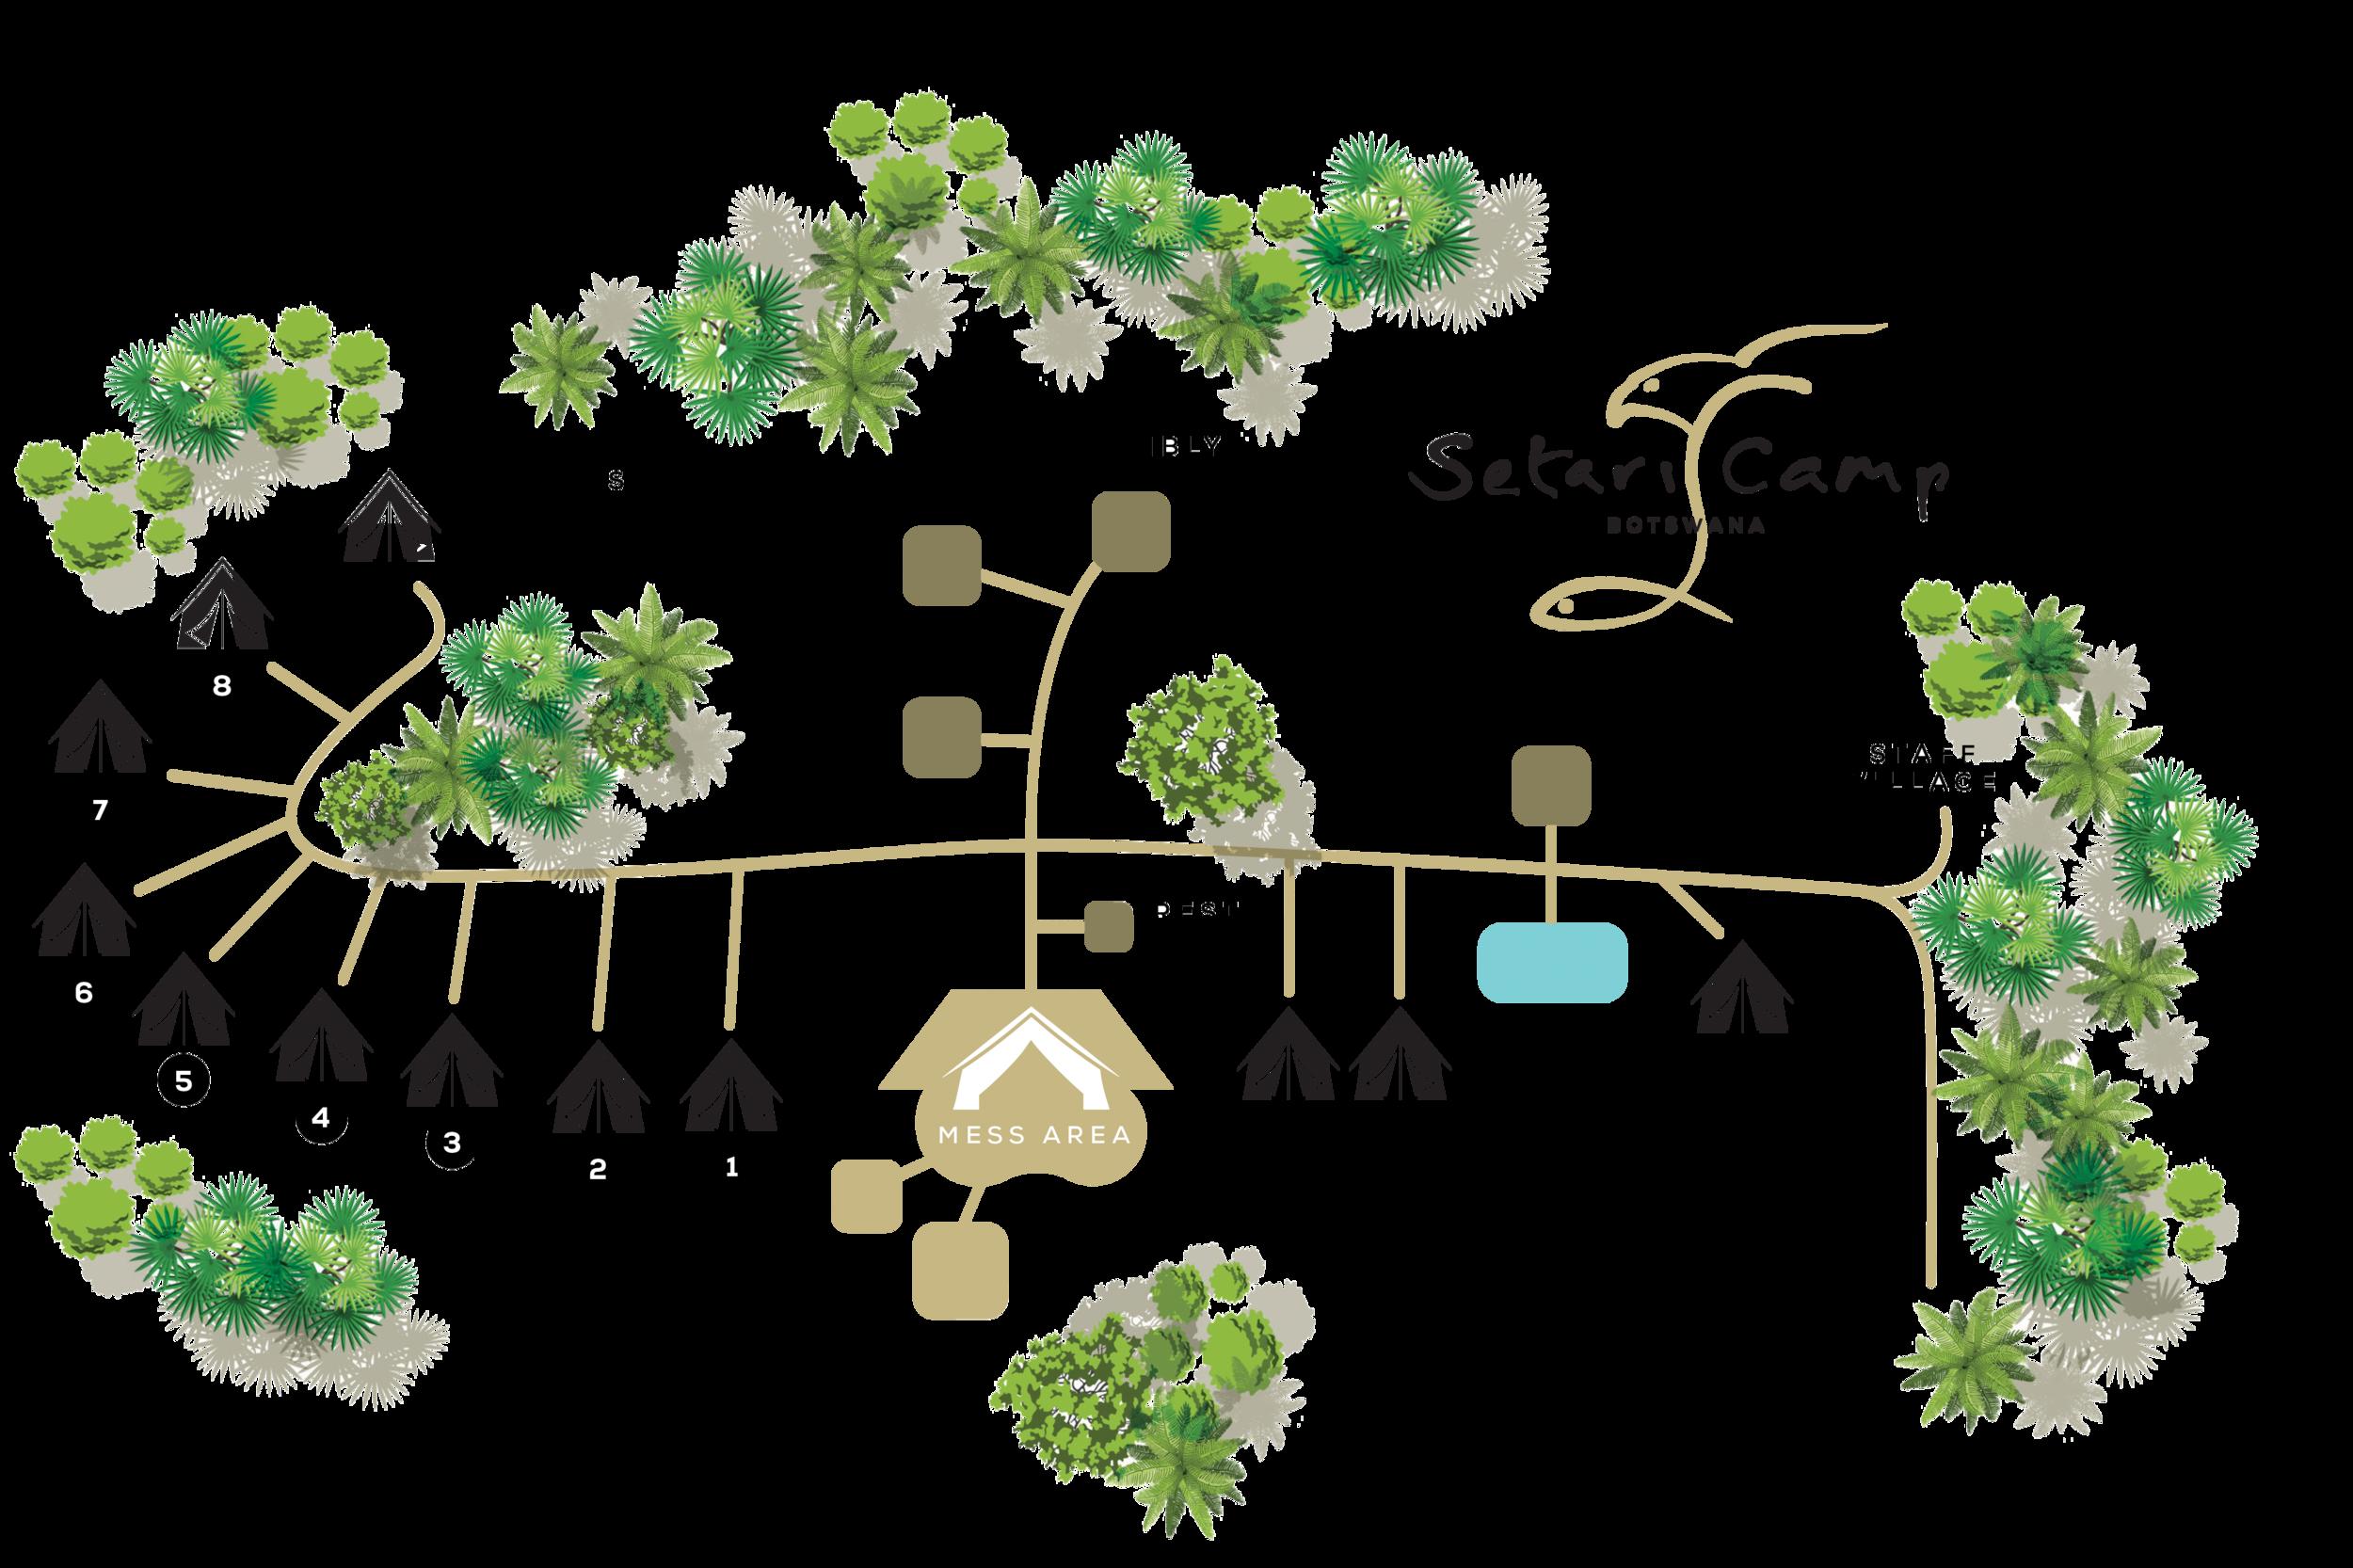 Setari Camp Botswana Layout Map.jpg